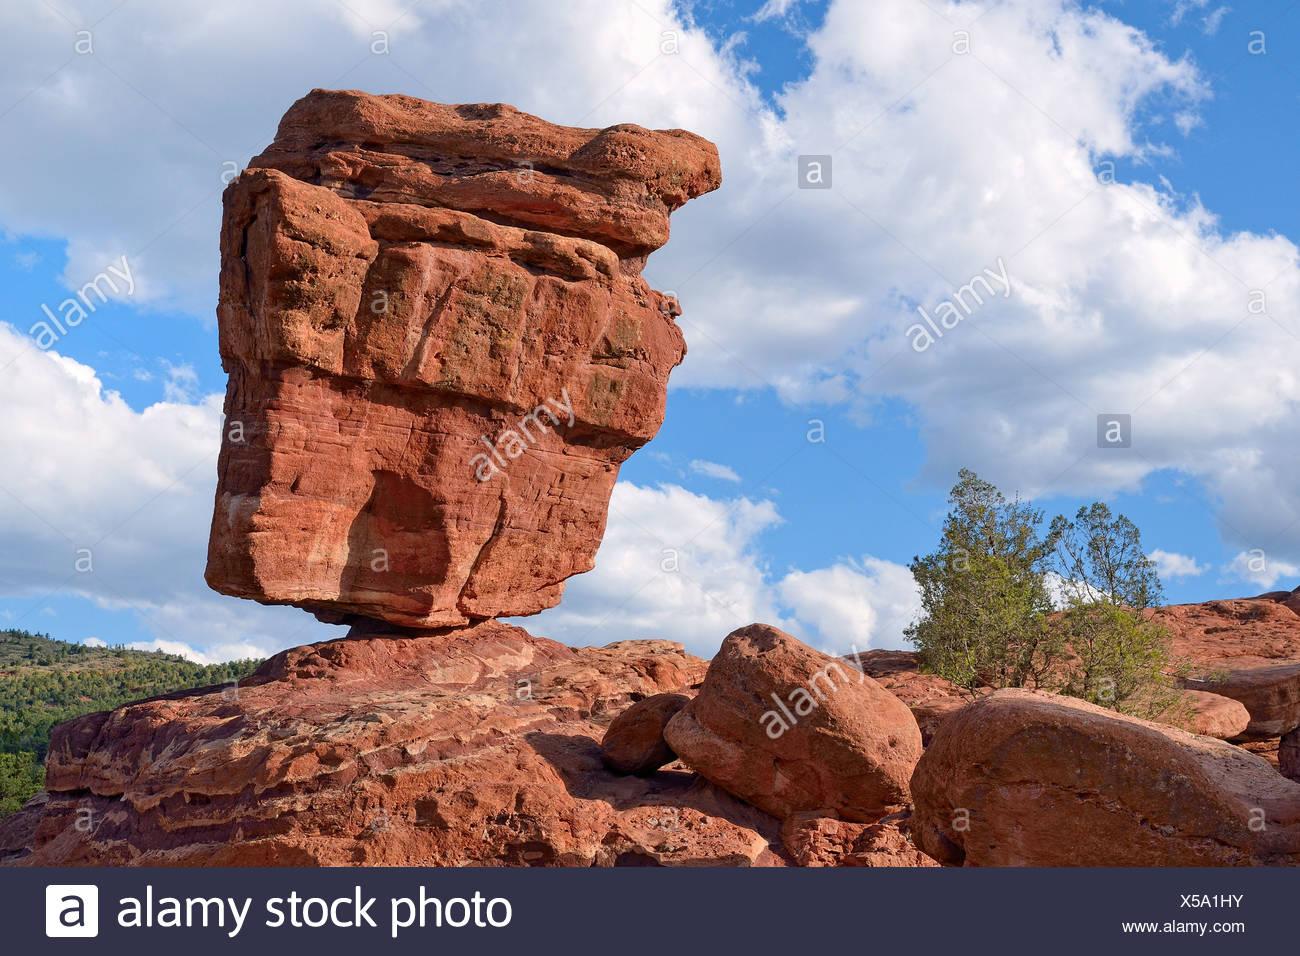 Balanced Rock, Garden of the Gods, red sandstone rocks, Colorado Springs, Colorado, USA - Stock Image